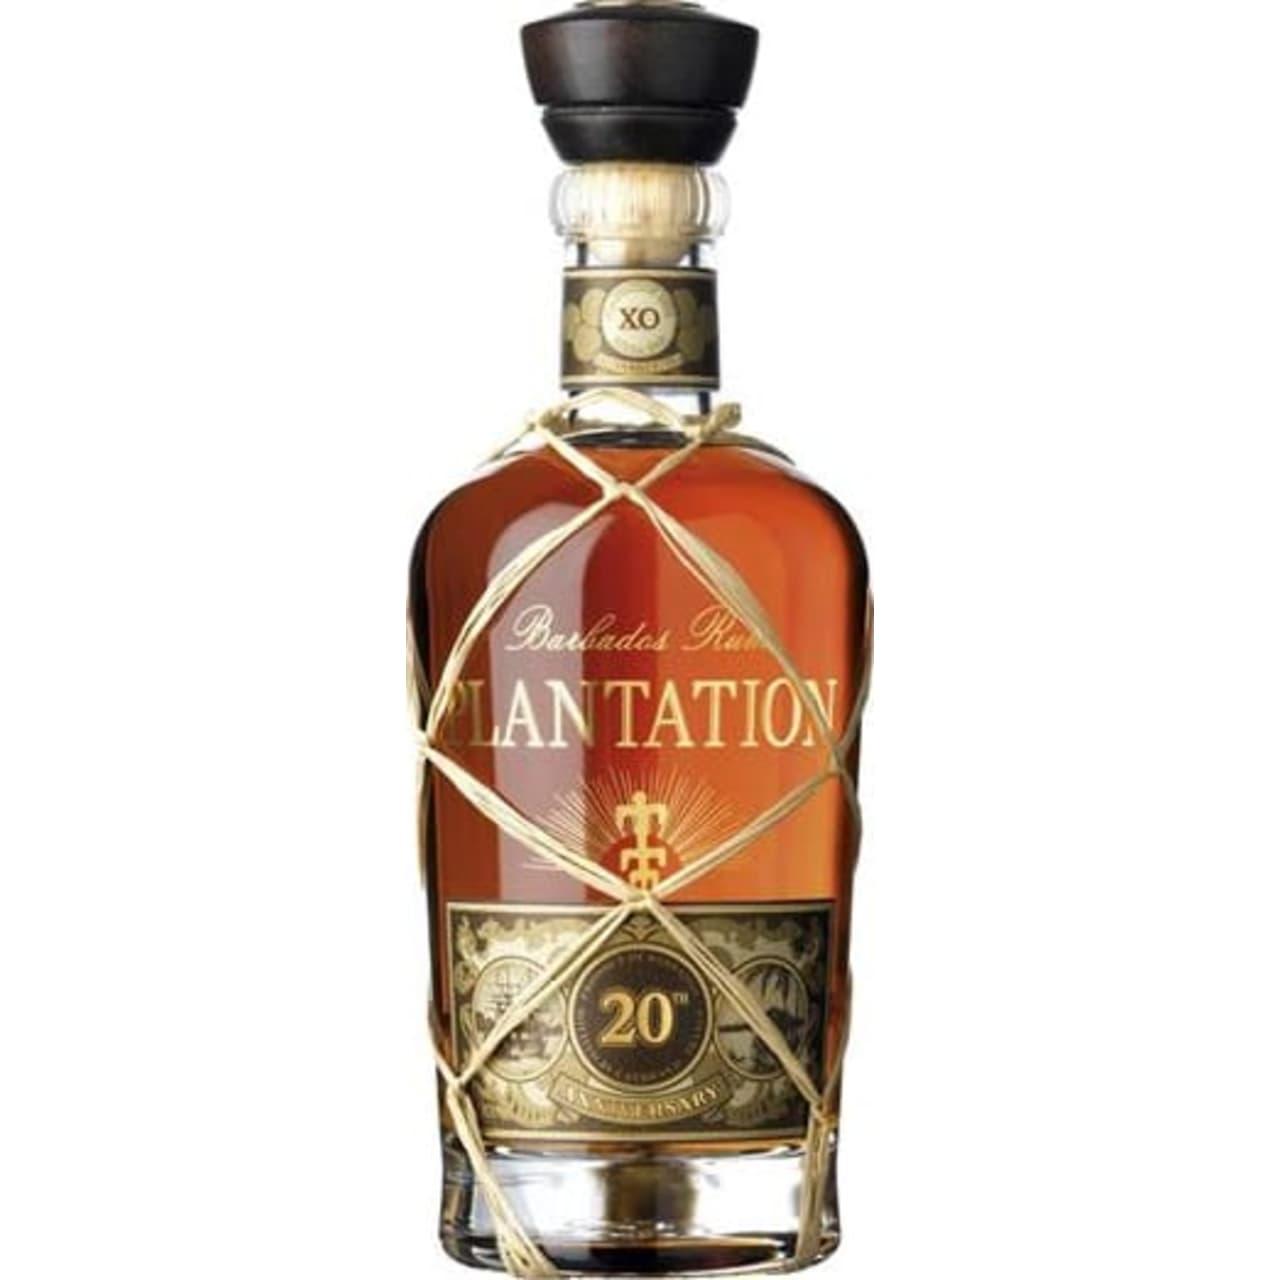 Product Image - Plantation XO Rum 20th Anniversary Decanter